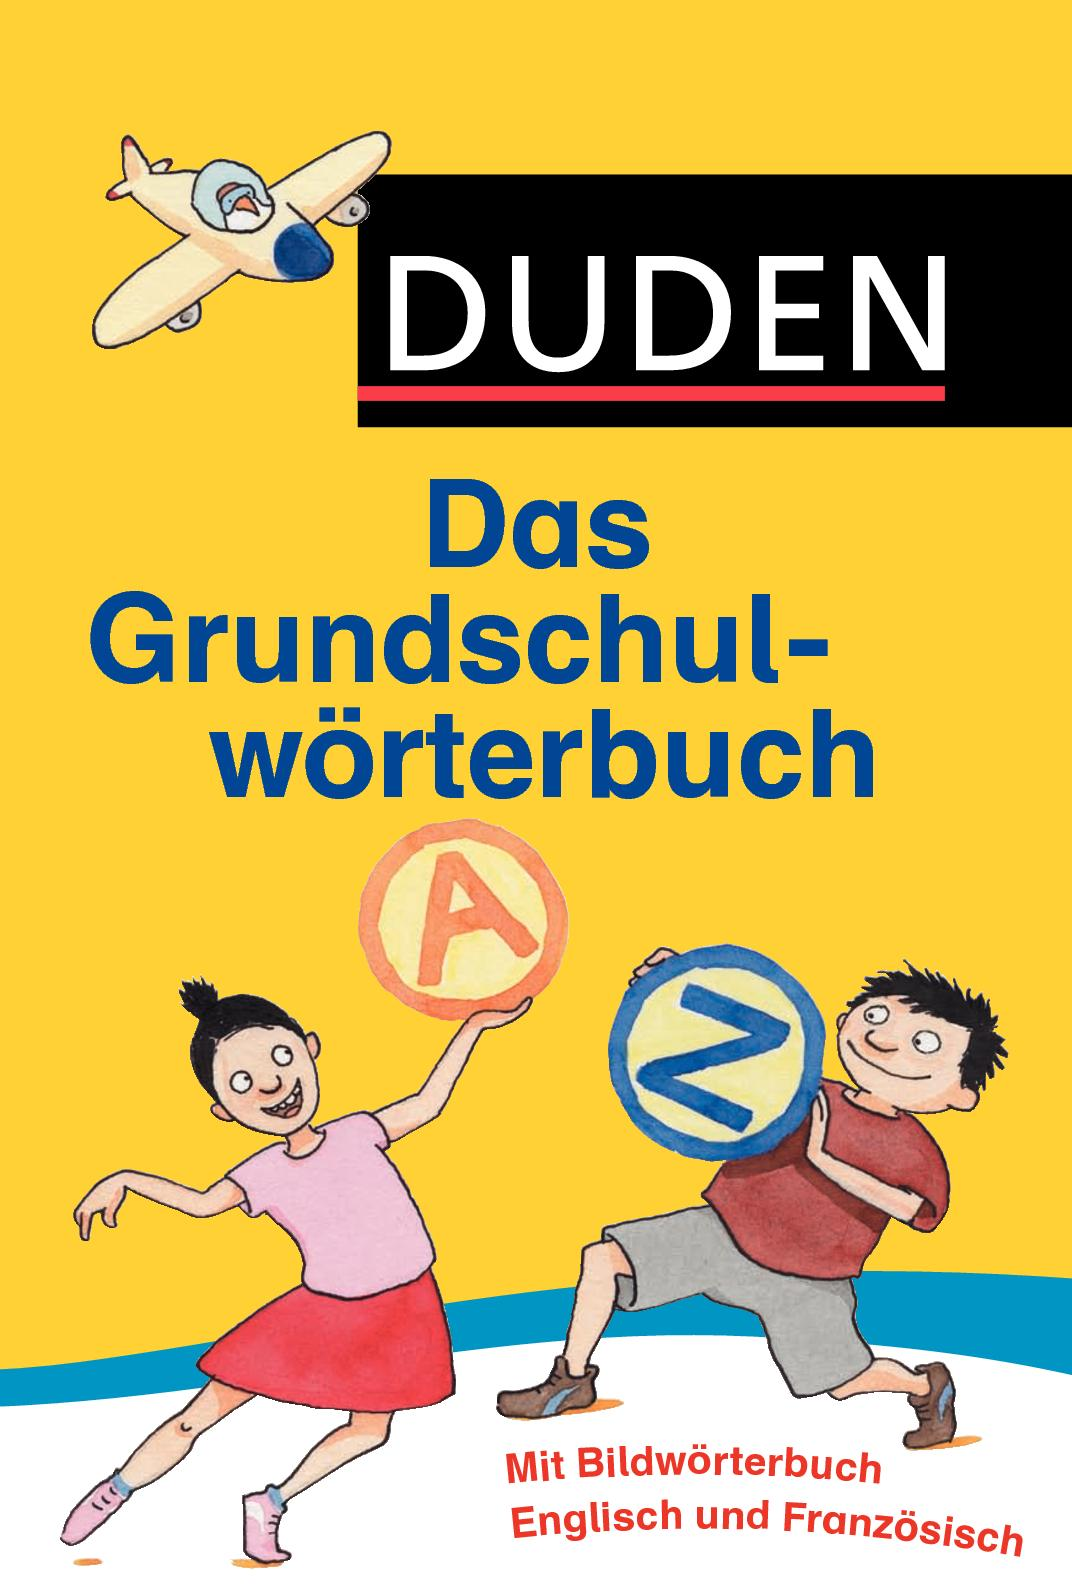 Calaméo - Duden, Das Grundschul-wörterbuch